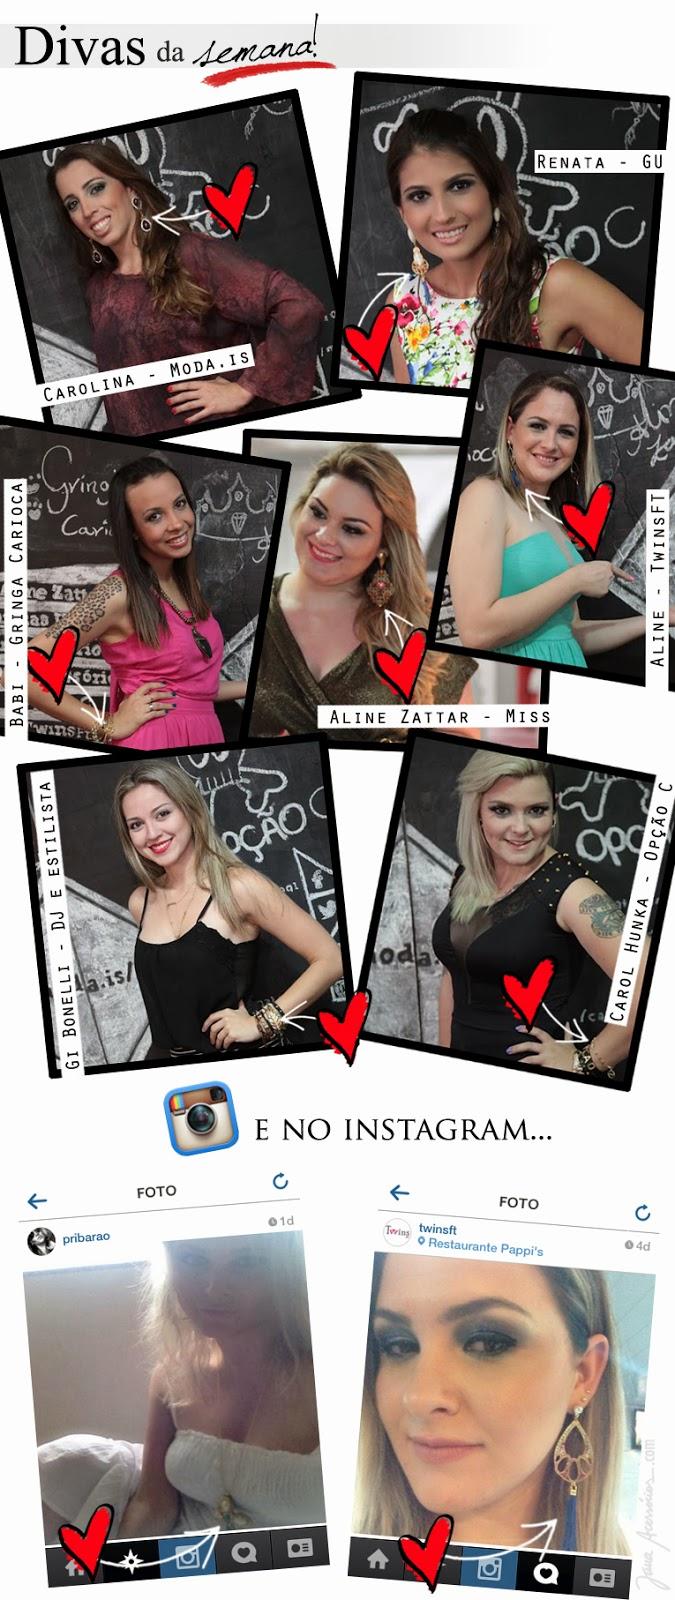 Divas, Divas de Jana Acessórios, Bloggers, blogueiras, Joinville, SC